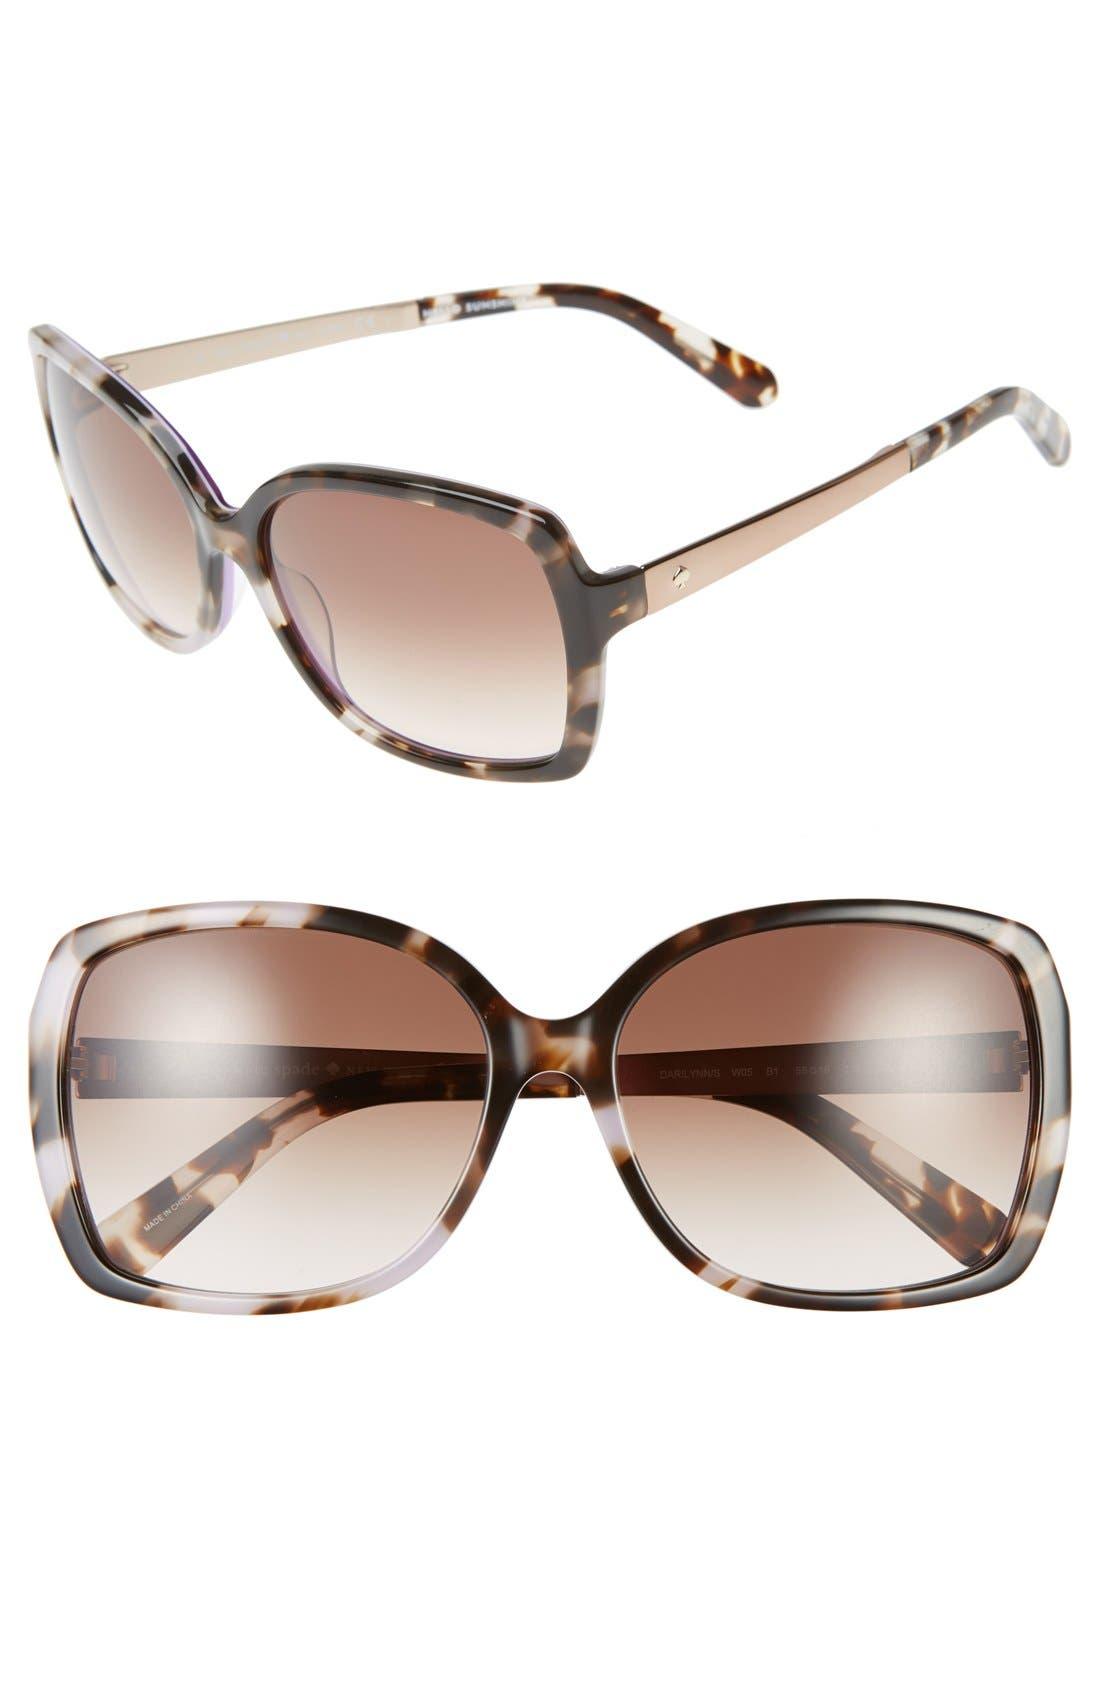 Alternate Image 1 Selected - kate spade new york 'darrilyn' 58mm butterfly sunglasses